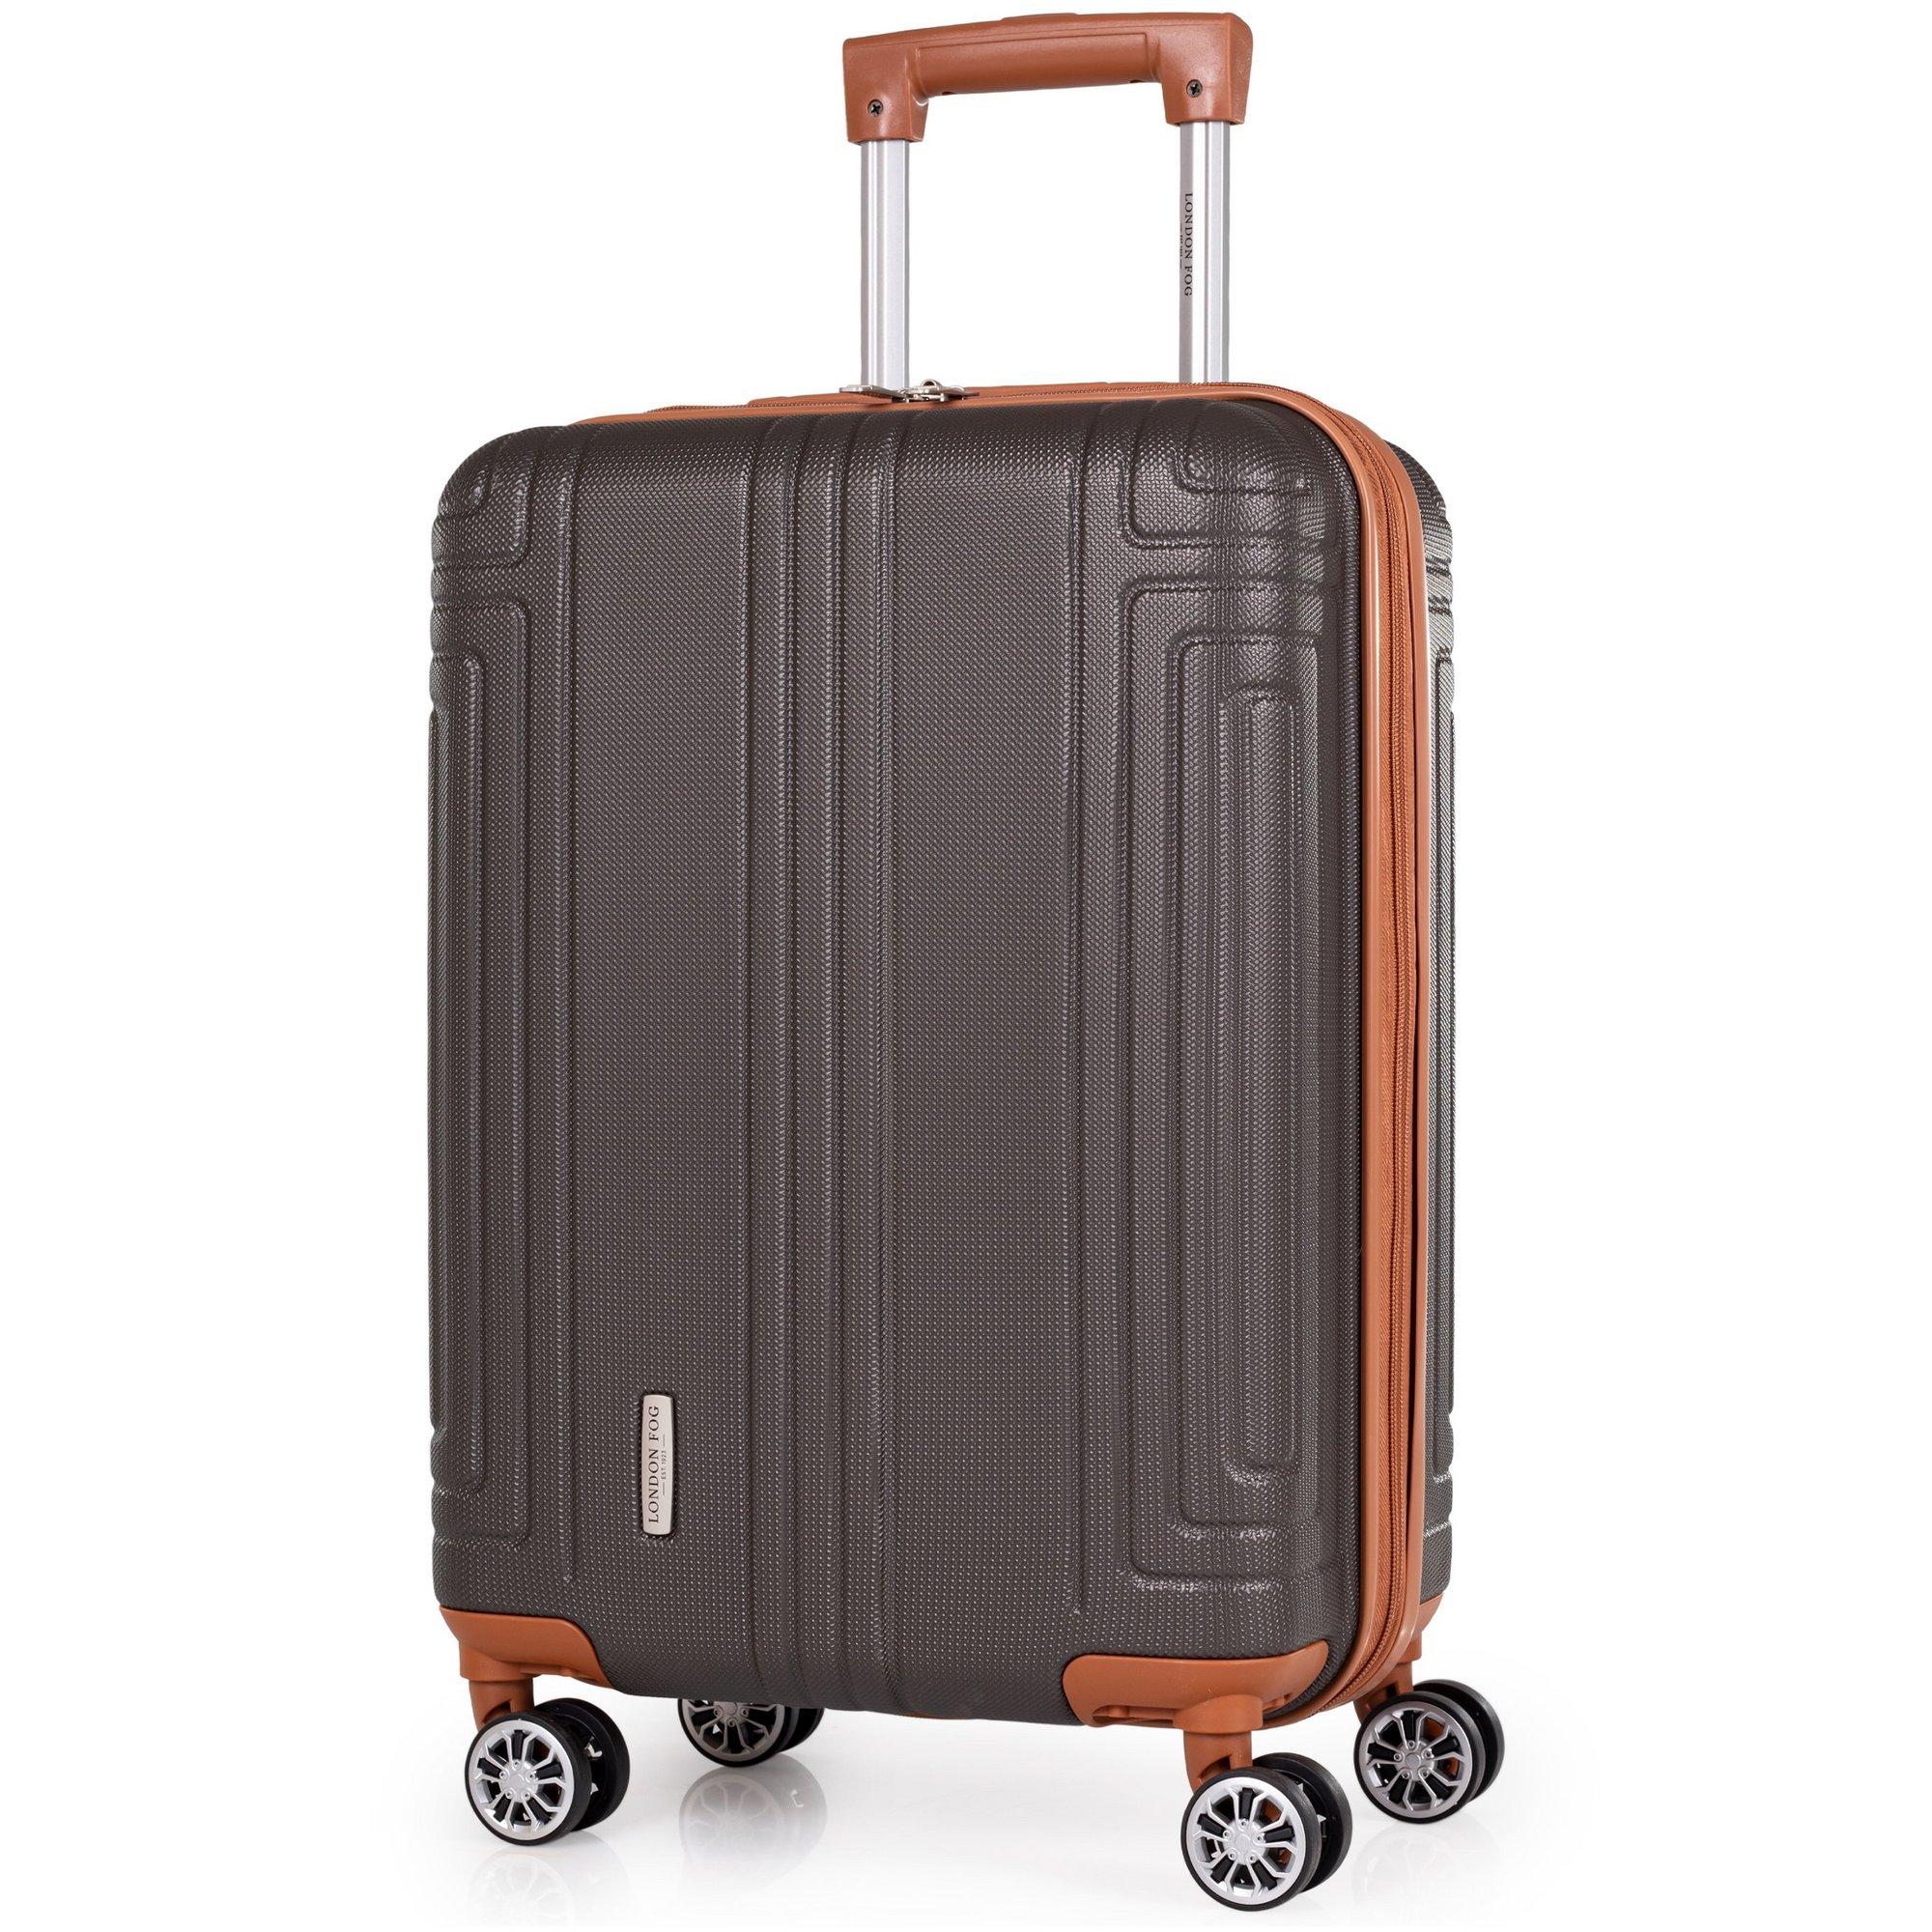 Image of London Fog Montagu ABS Suitcase